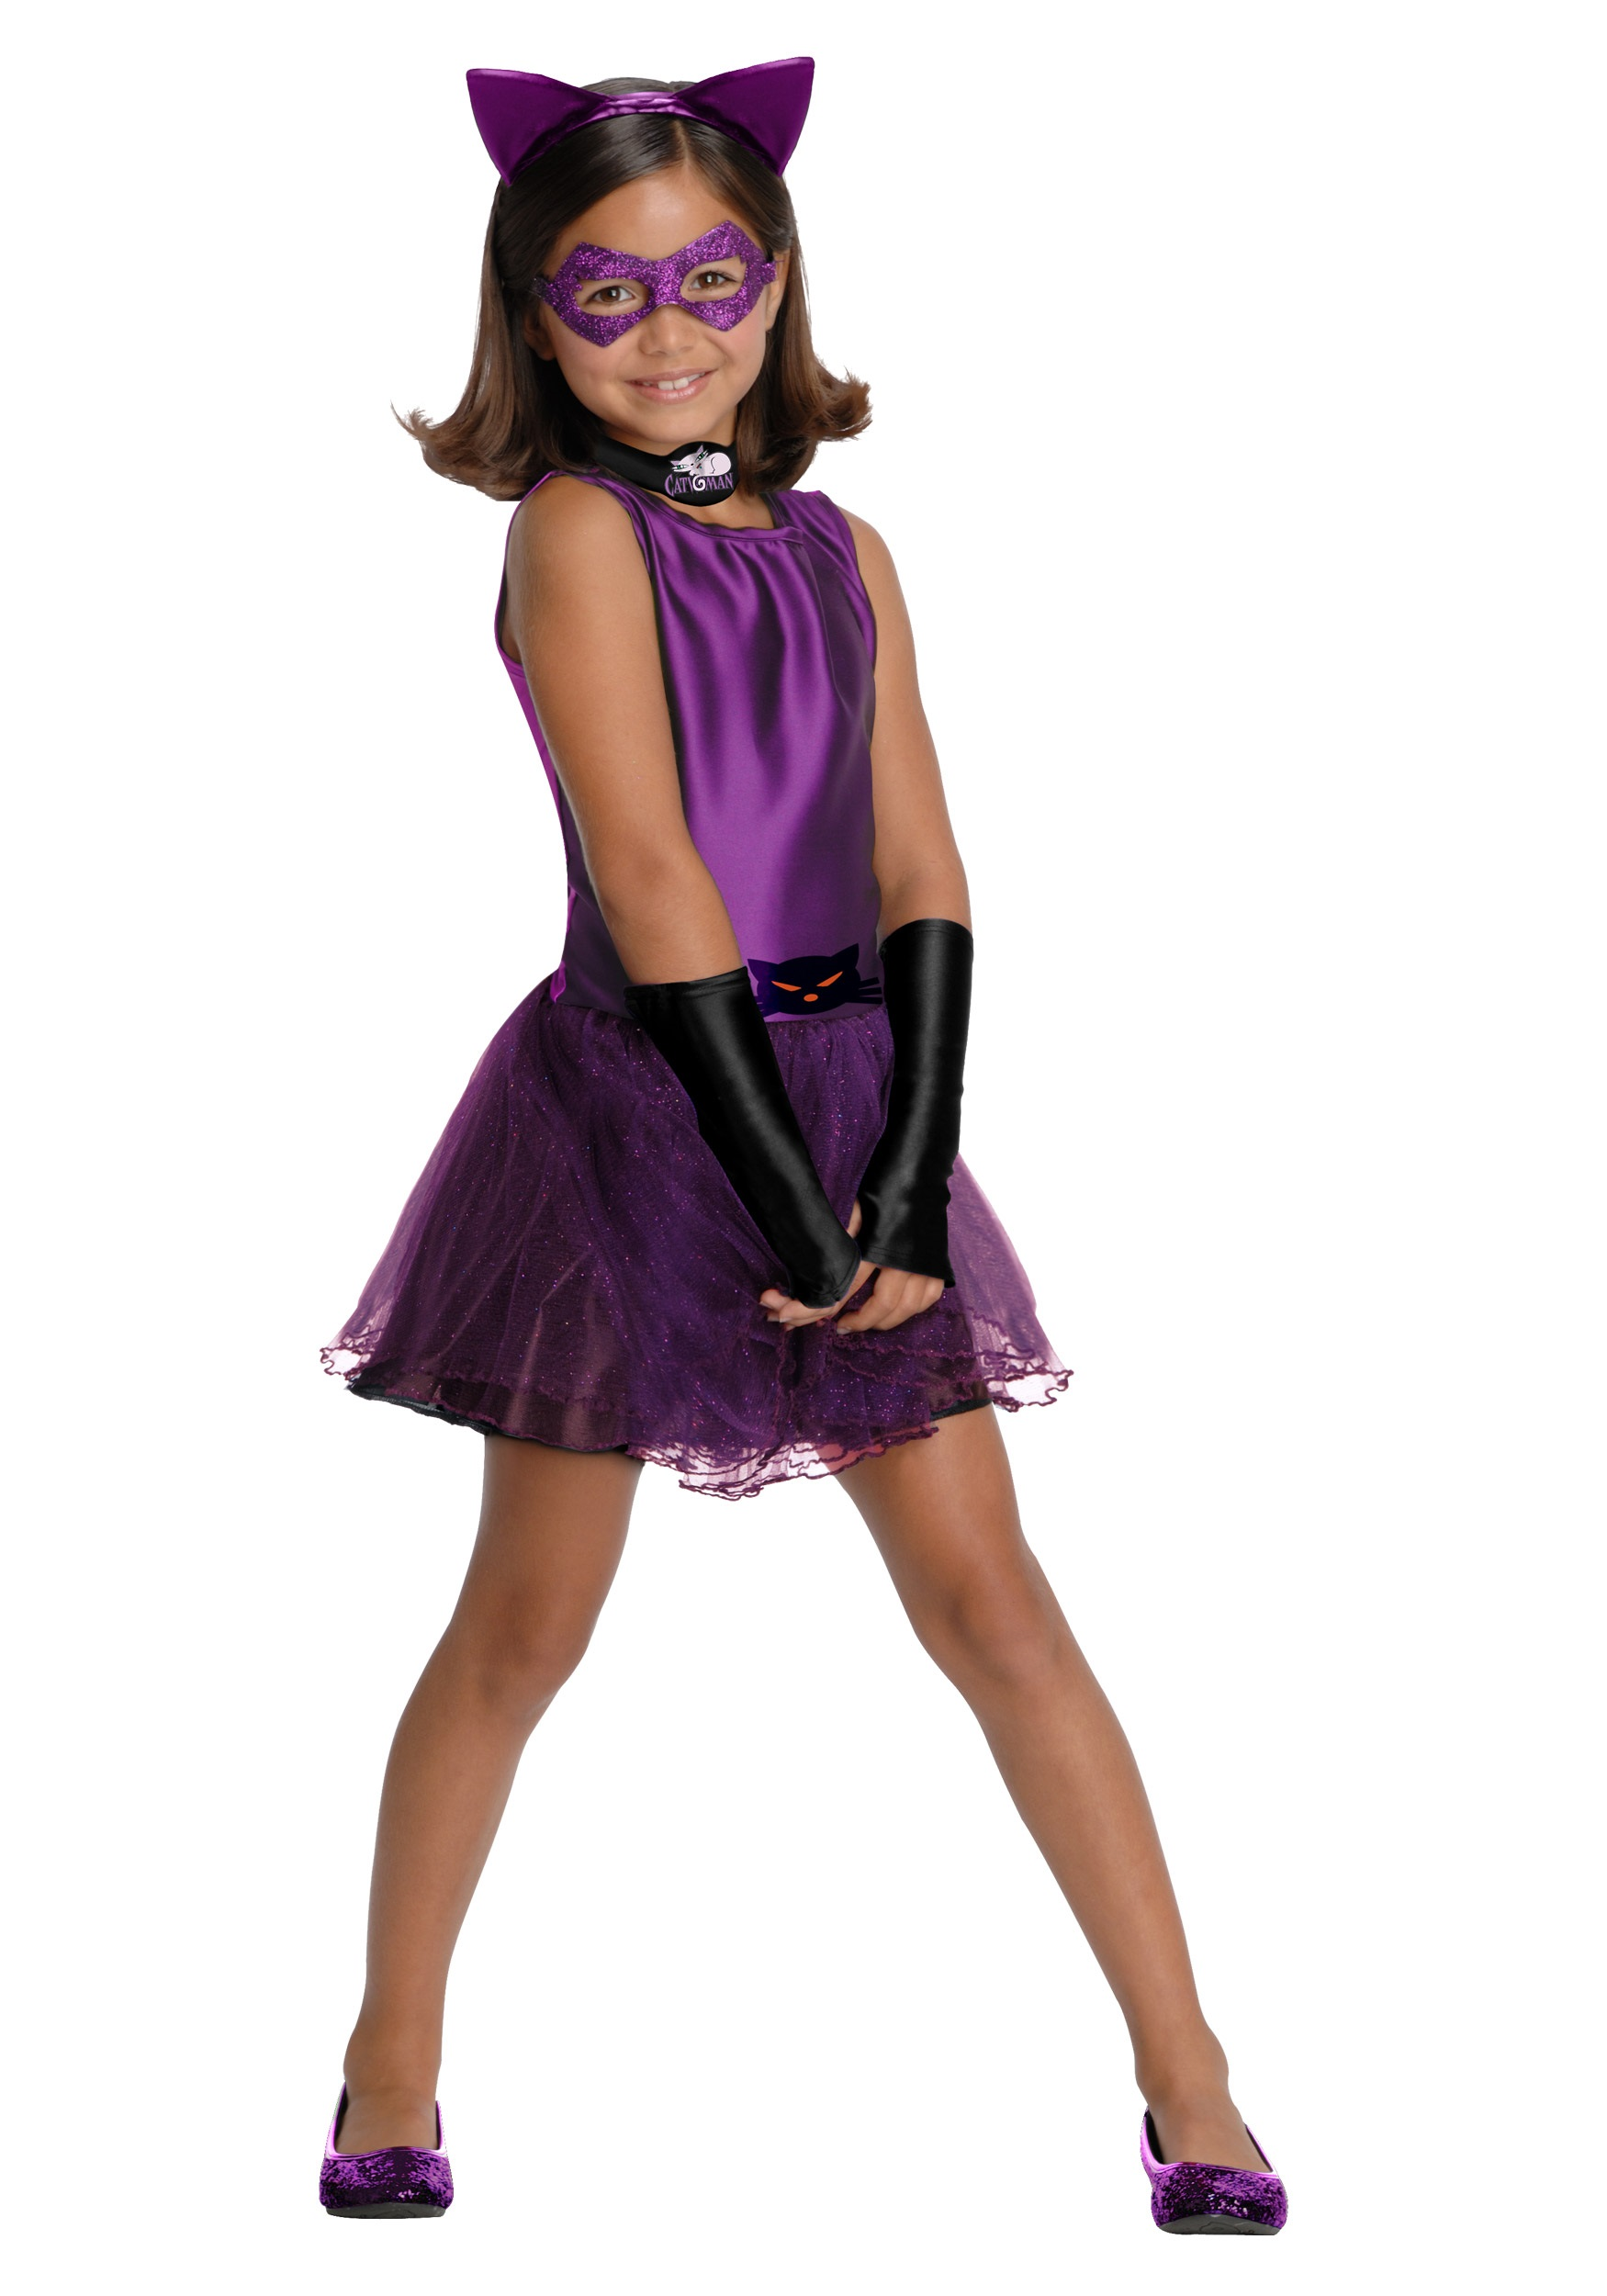 Girls Catwoman Tutu Costume  sc 1 st  Halloween Costumes & Girls Catwoman Tutu Costume - Halloween Costumes